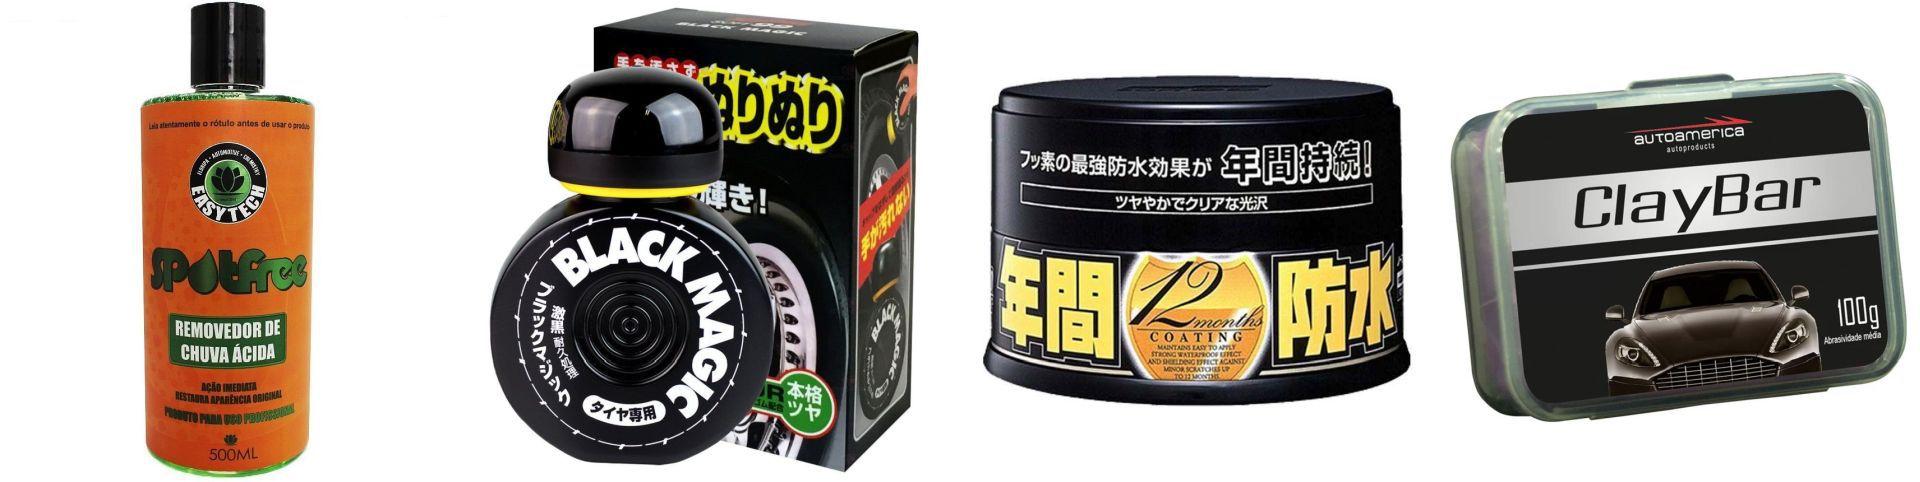 Kit Spotfree + Pretinho Black Magic + Fusso Black+ Clay Bar